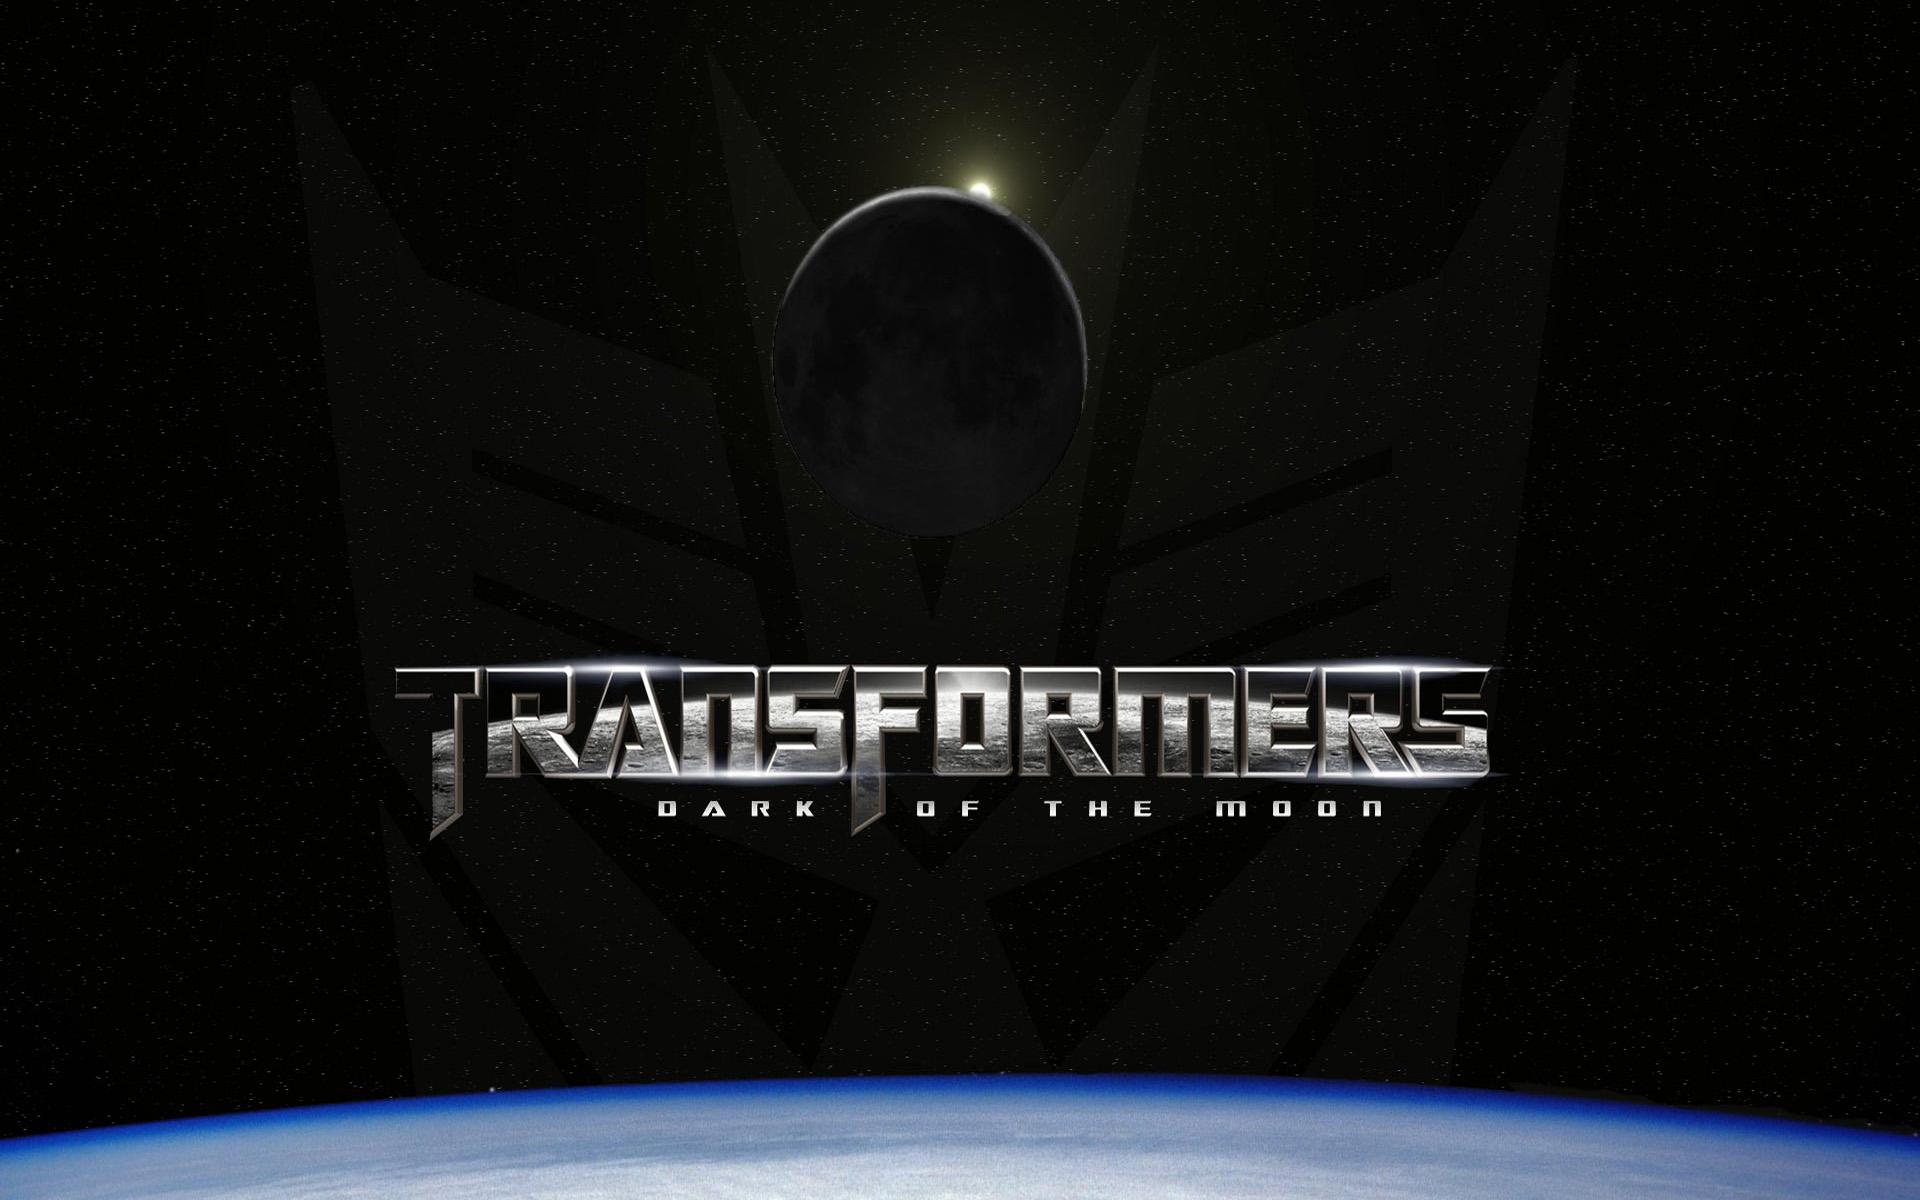 Transformers 3 Dark Of The Moon Wallpapers 1920 X 1200 Pixels